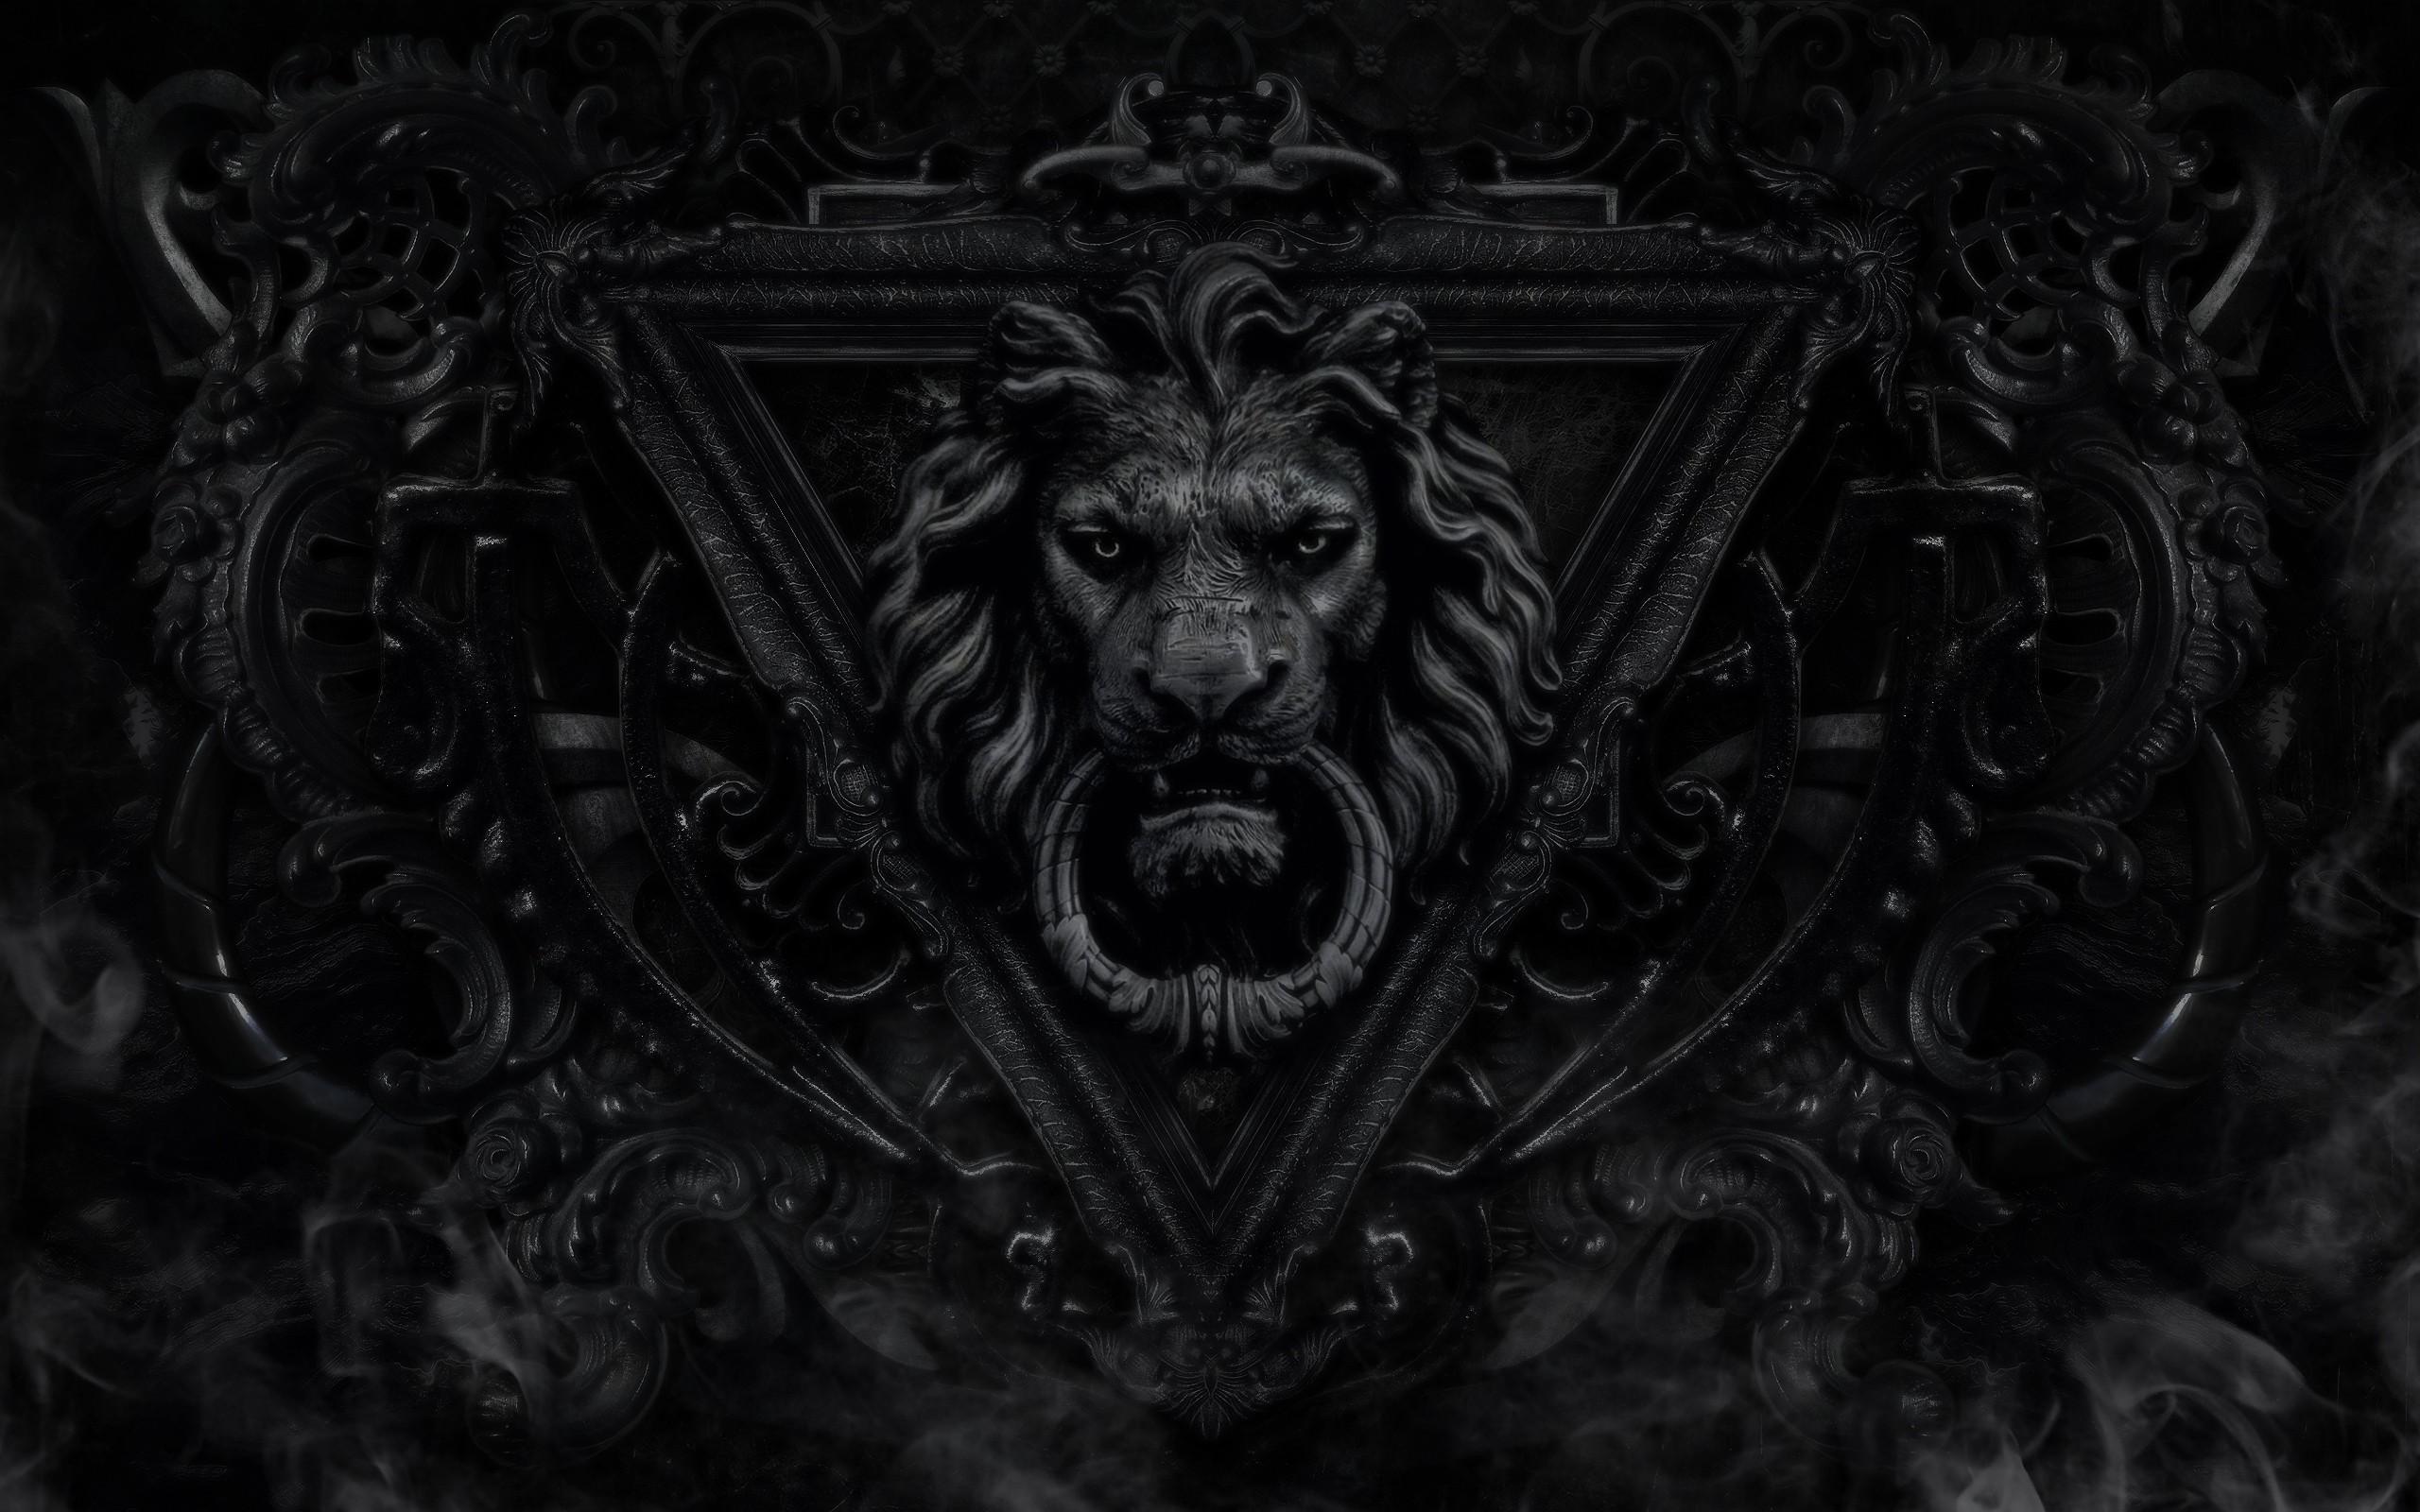 2560x1600 Lion Black And White Hd Desktop Wallpapers Jpg